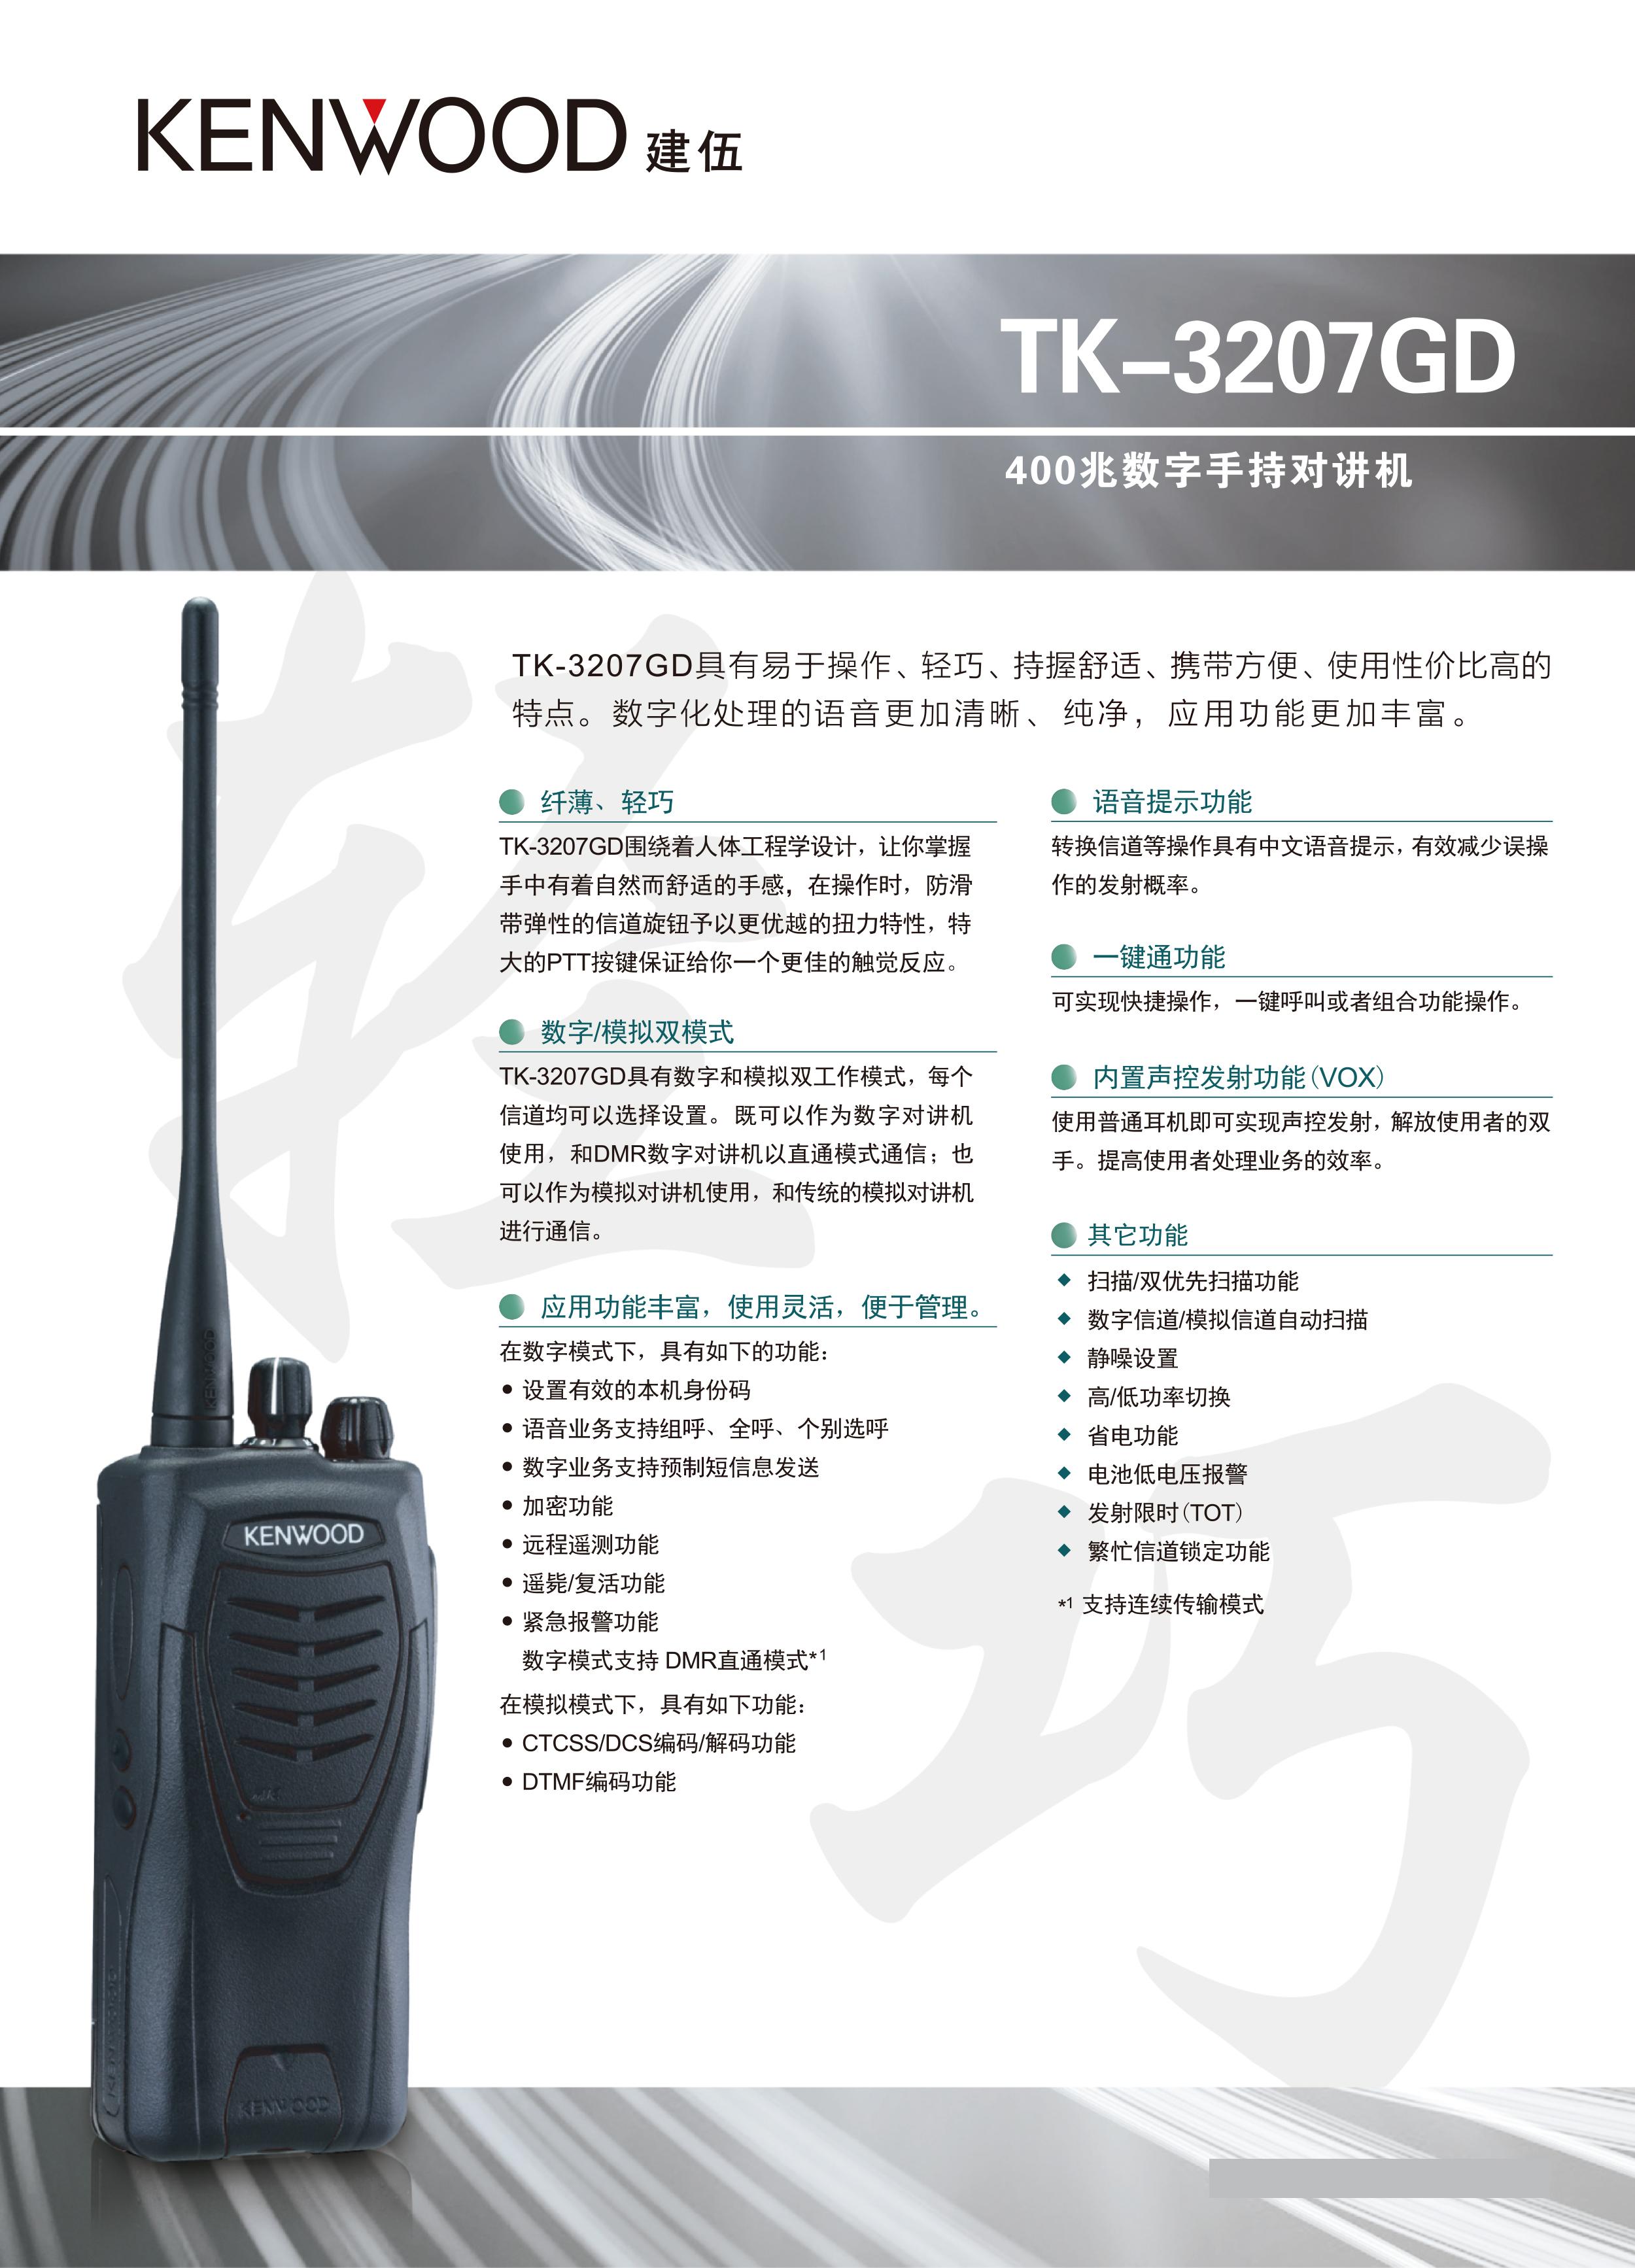 TK-3207GD数字对讲机彩页_01